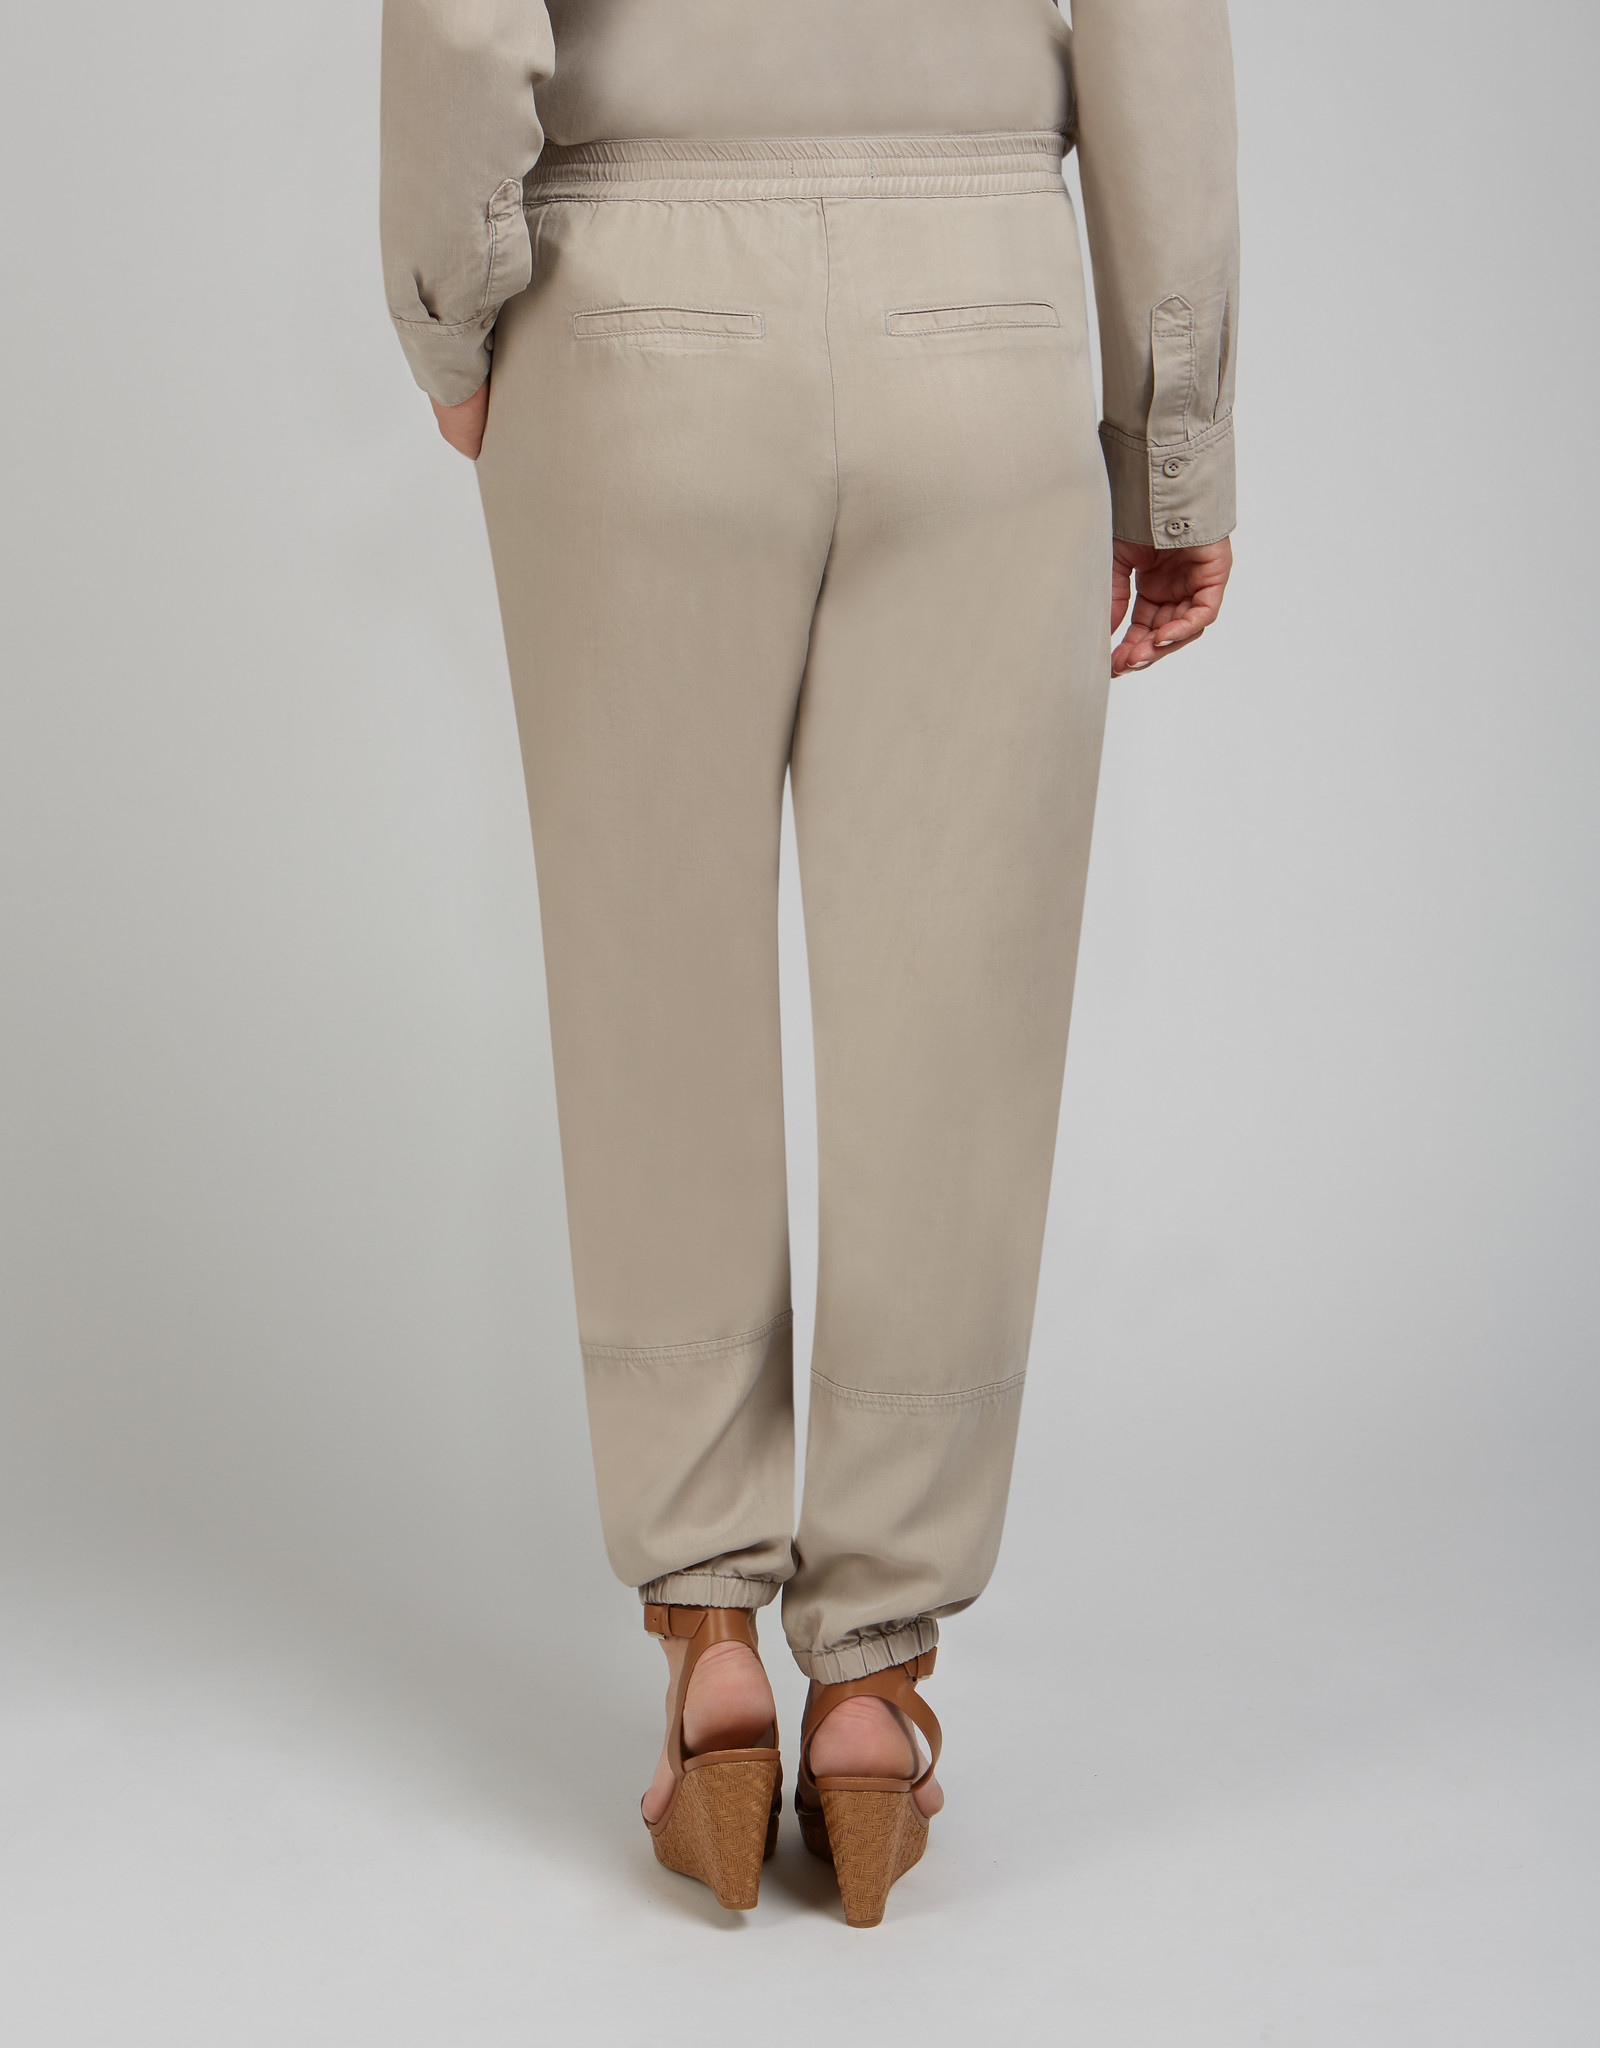 Renuar Renuar R1964 Woven Pant Made with Tencel